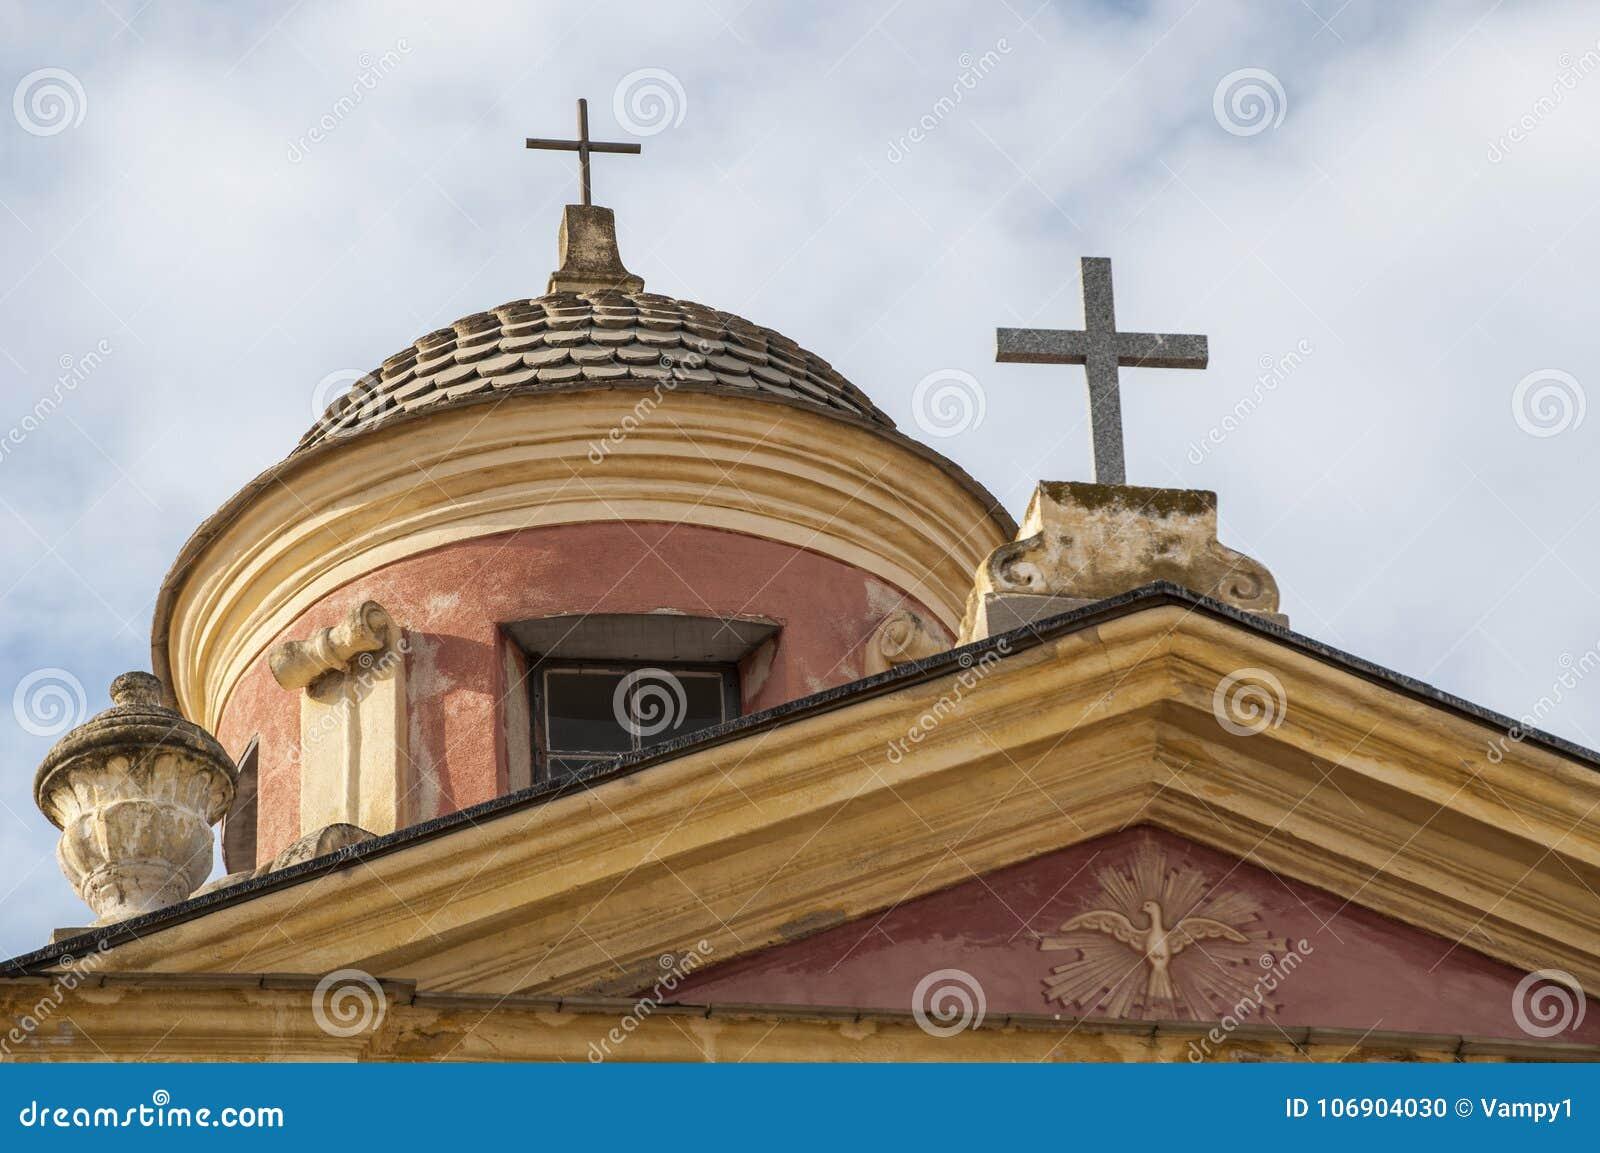 Calvi, cytadela, kościół, antyczne ściany, linia horyzontu, Corsica, Corse, Francja, Europa, wyspa